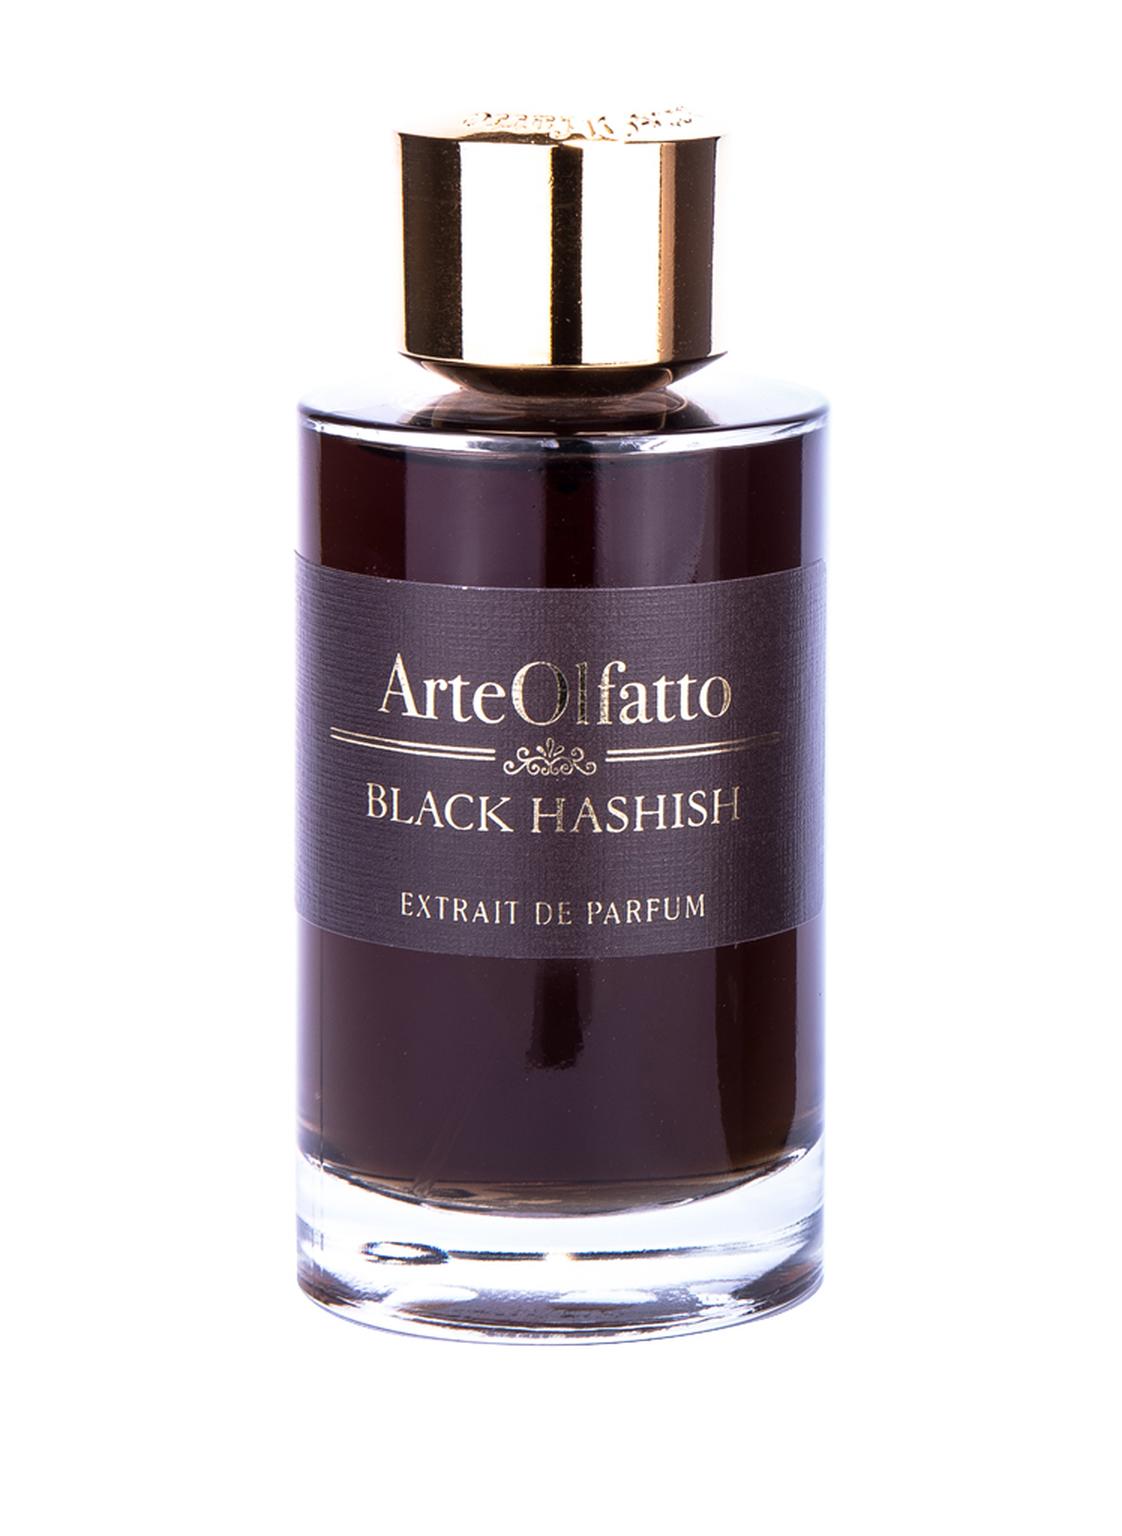 Image of Arte Olfatto Black Hashish Eau de Parfum 100 ml